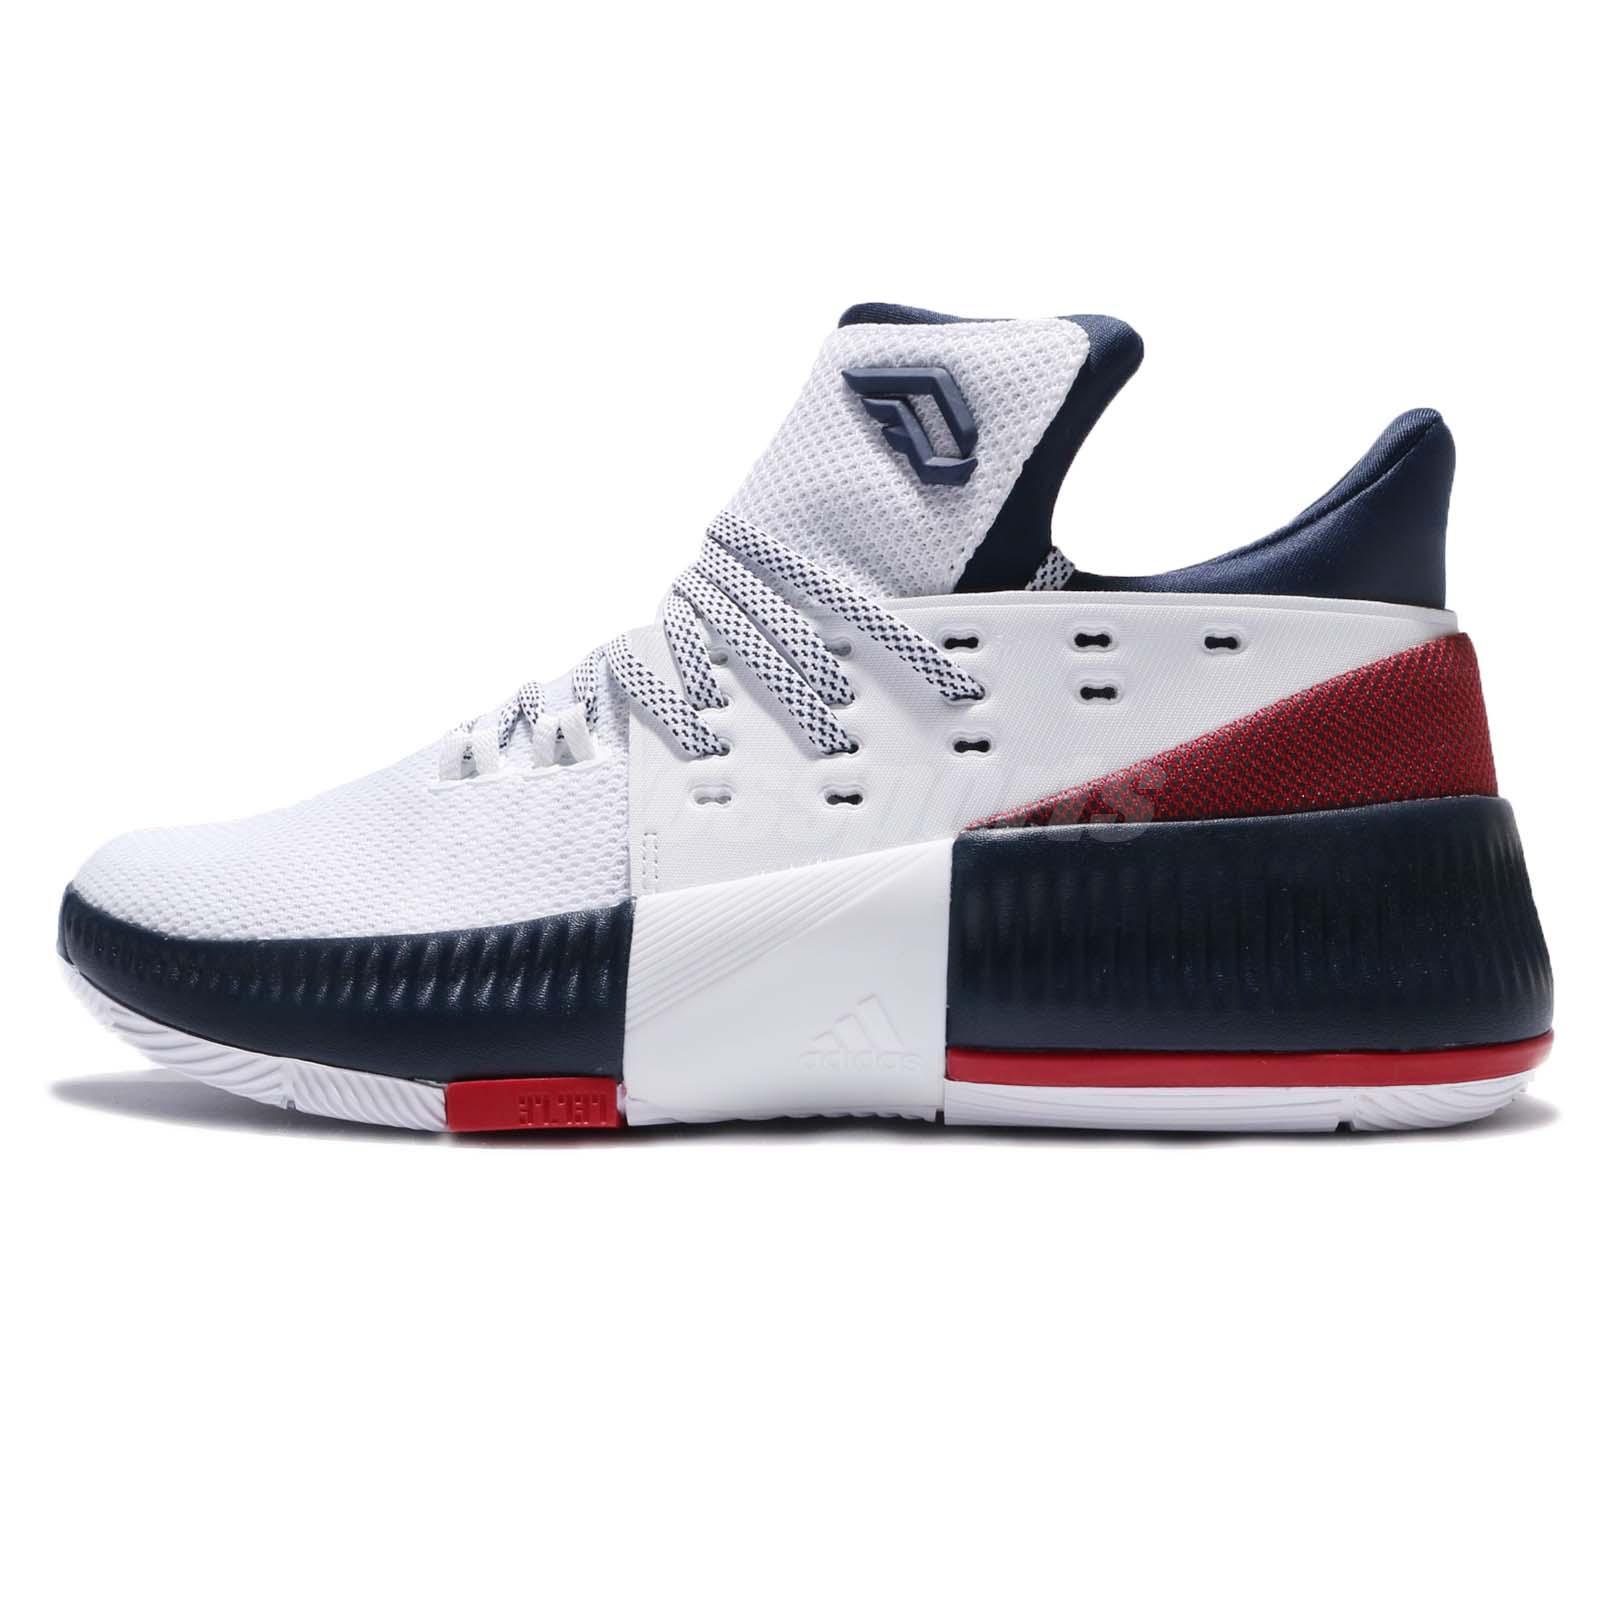 54fbdc1c82b adidas Dame 3 J Damian Lillard Navy Red White Kids Basketball Shoes BW1101